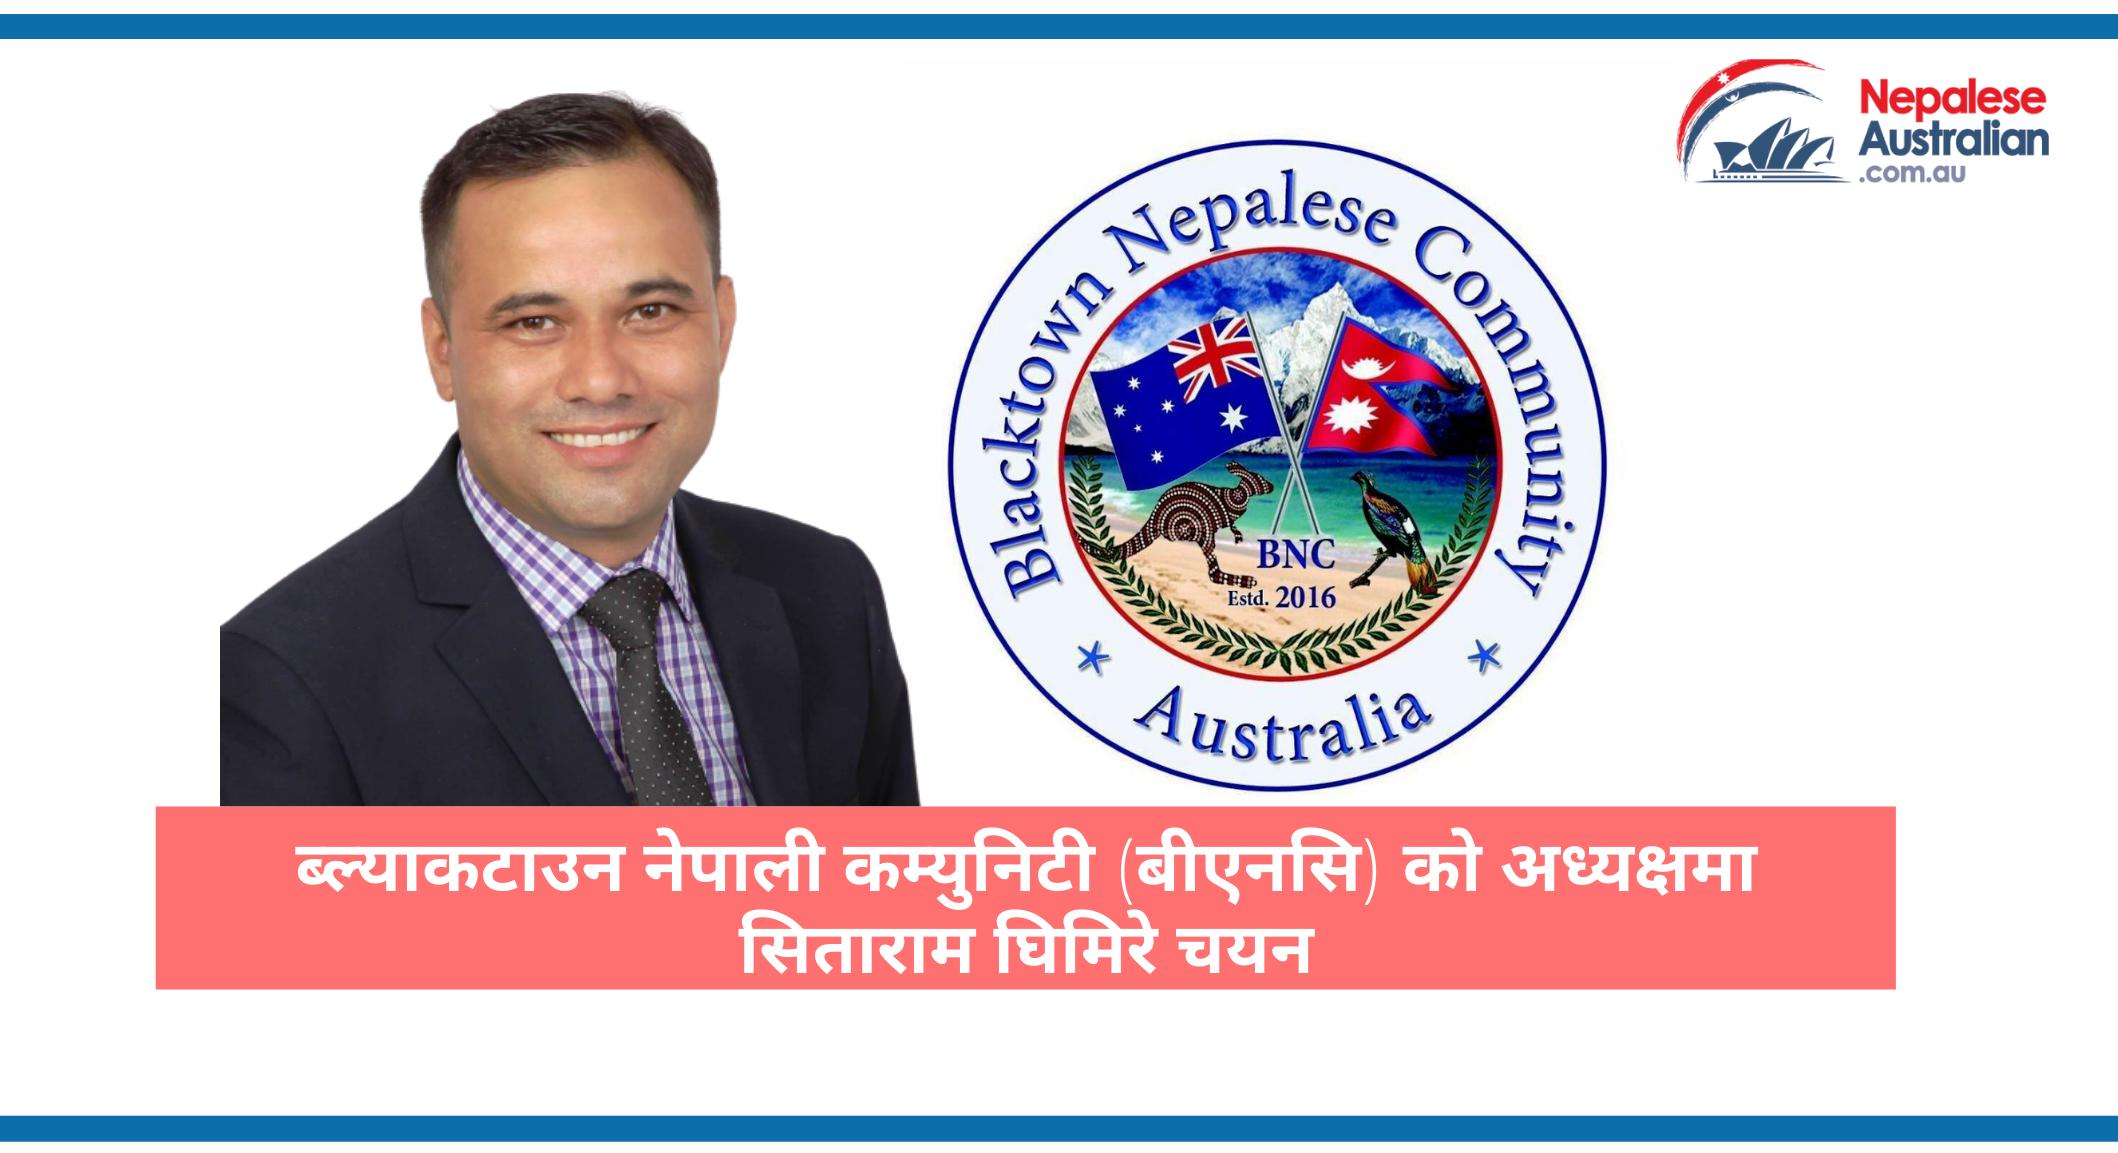 Blacktown Nepalese Community - BNC